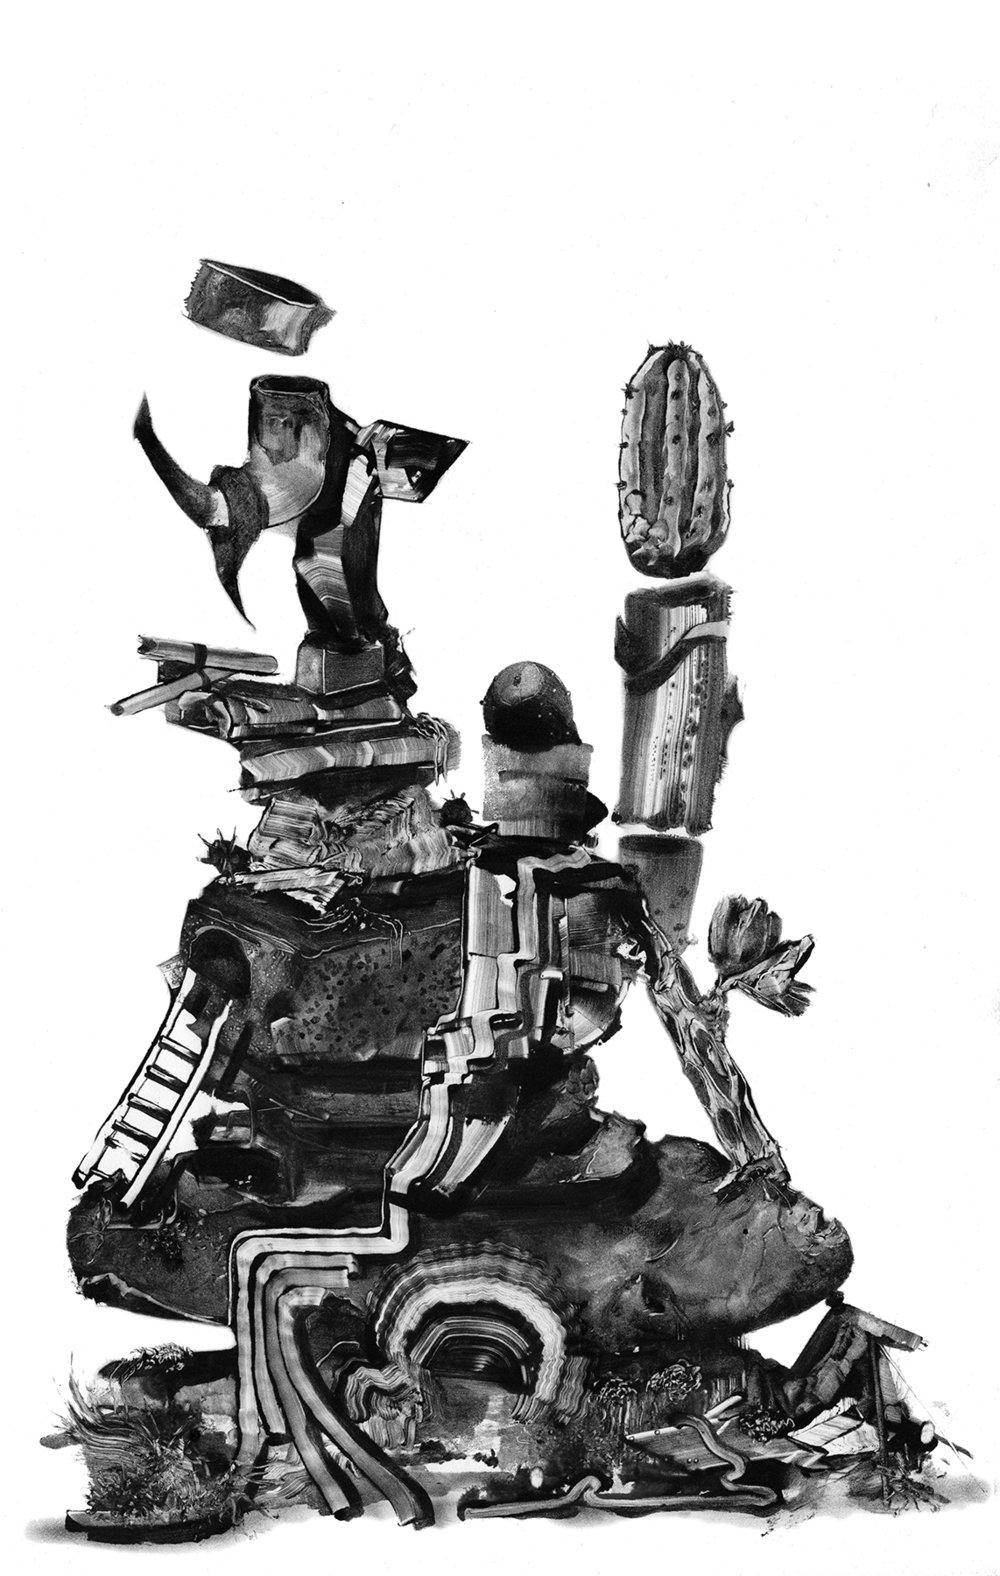 Grady Gordon monotype print